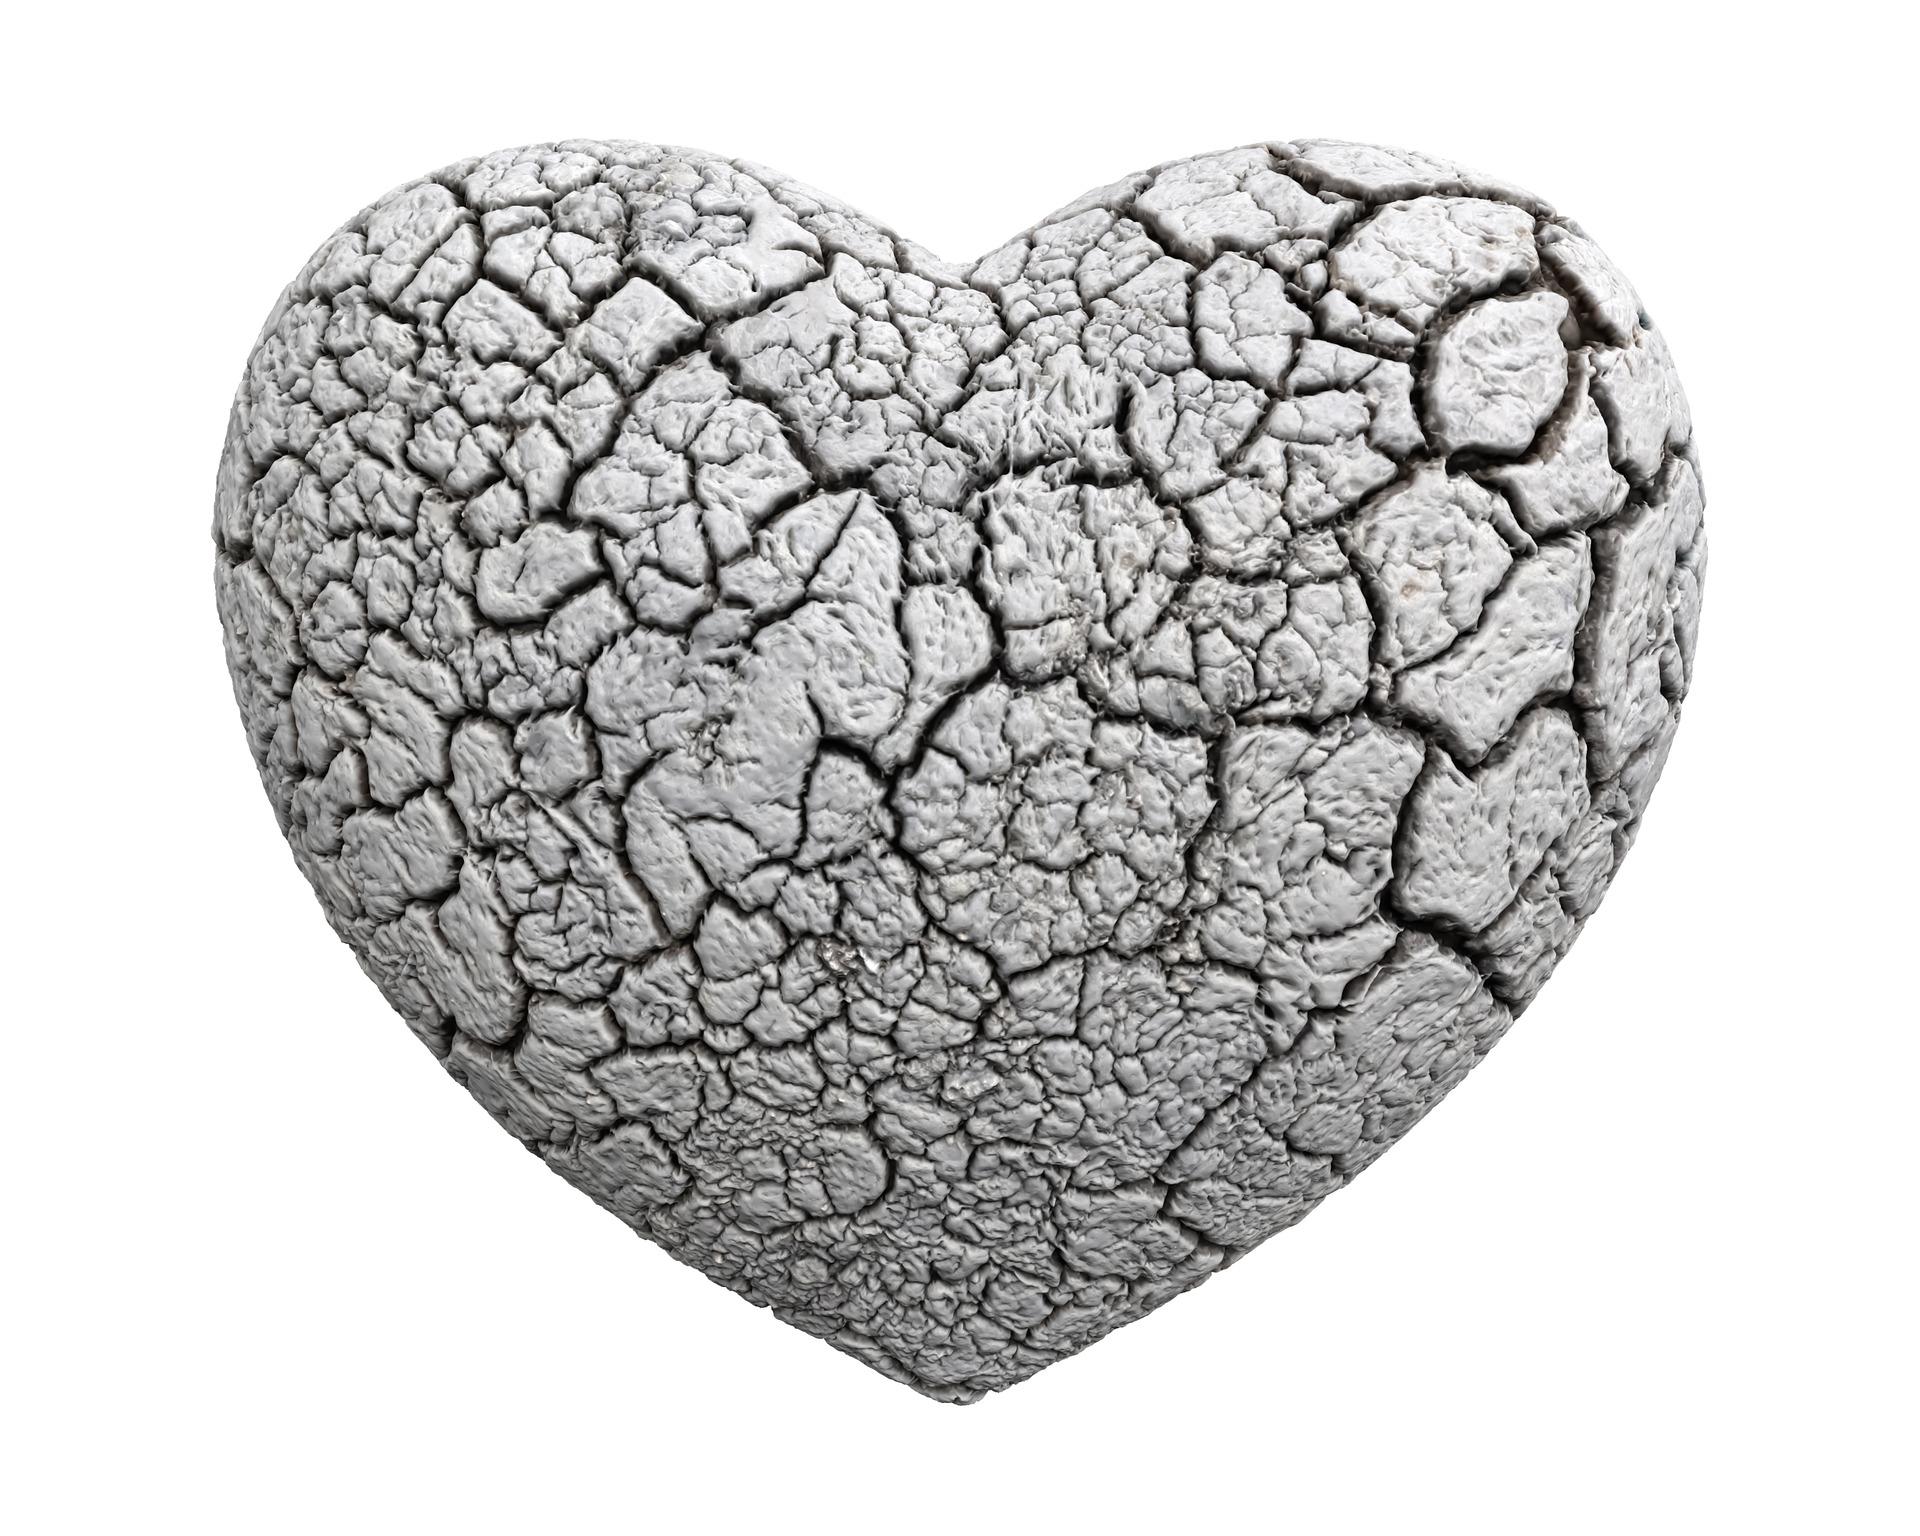 heart-1463424_1920